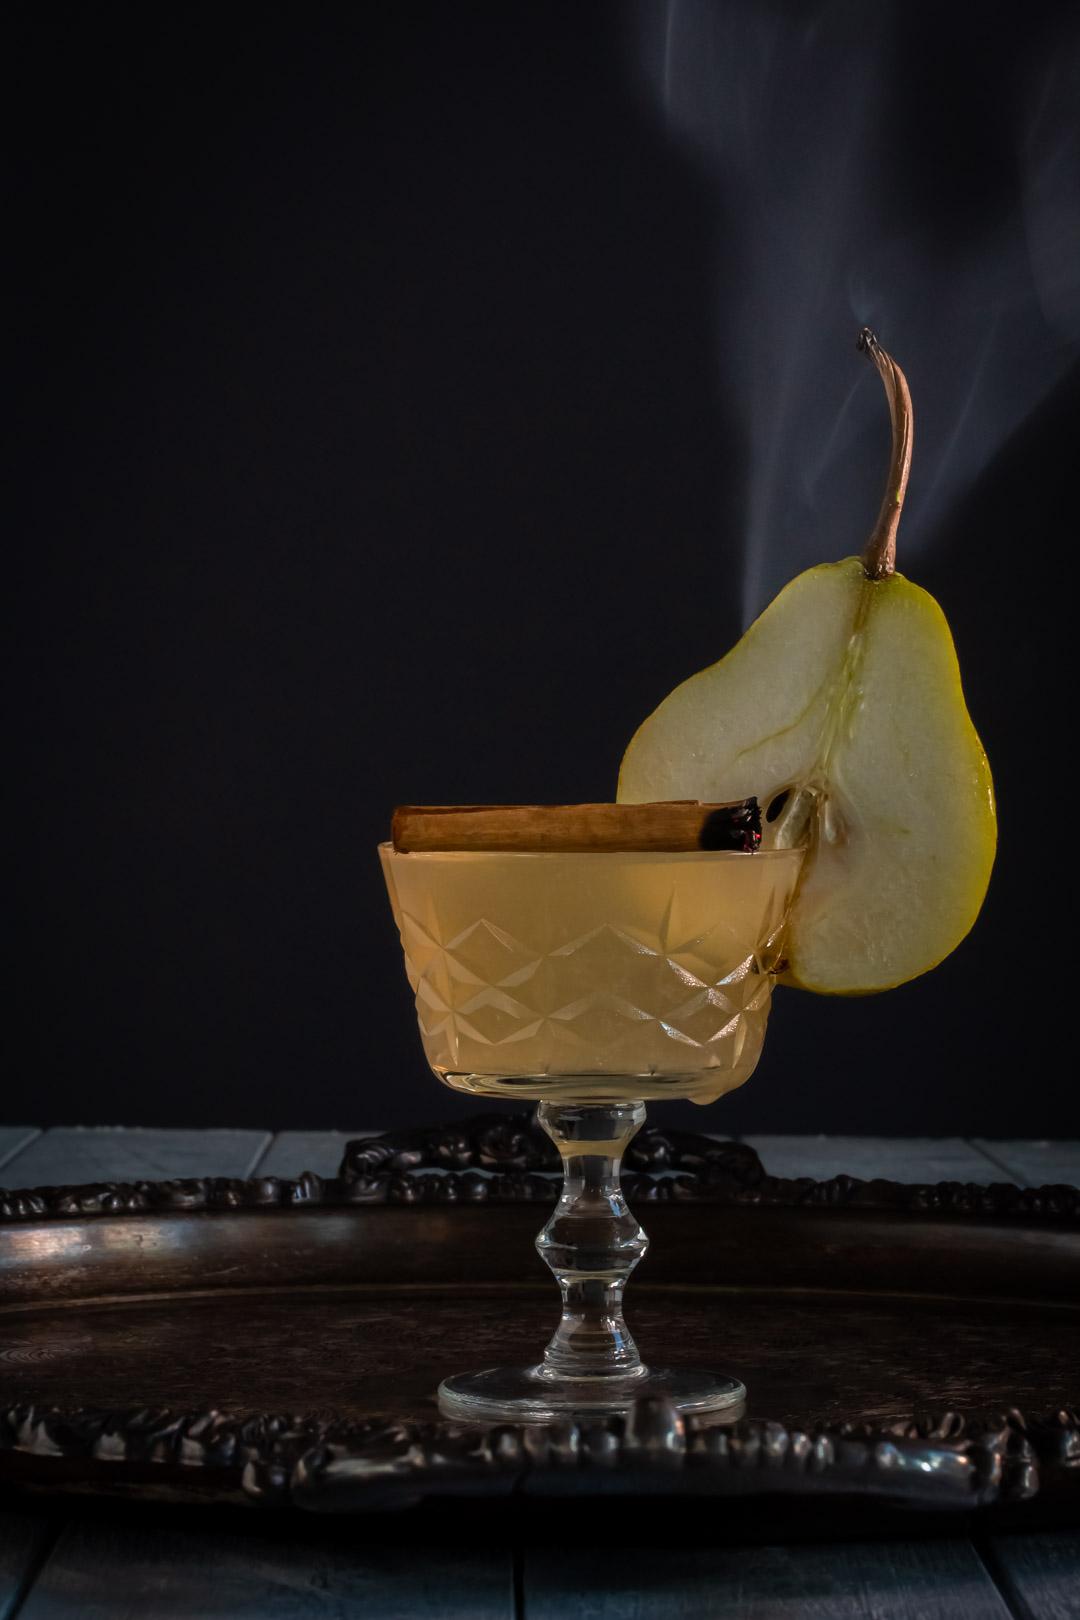 pear cinnamon sour with cinnamon smoke and pear slice